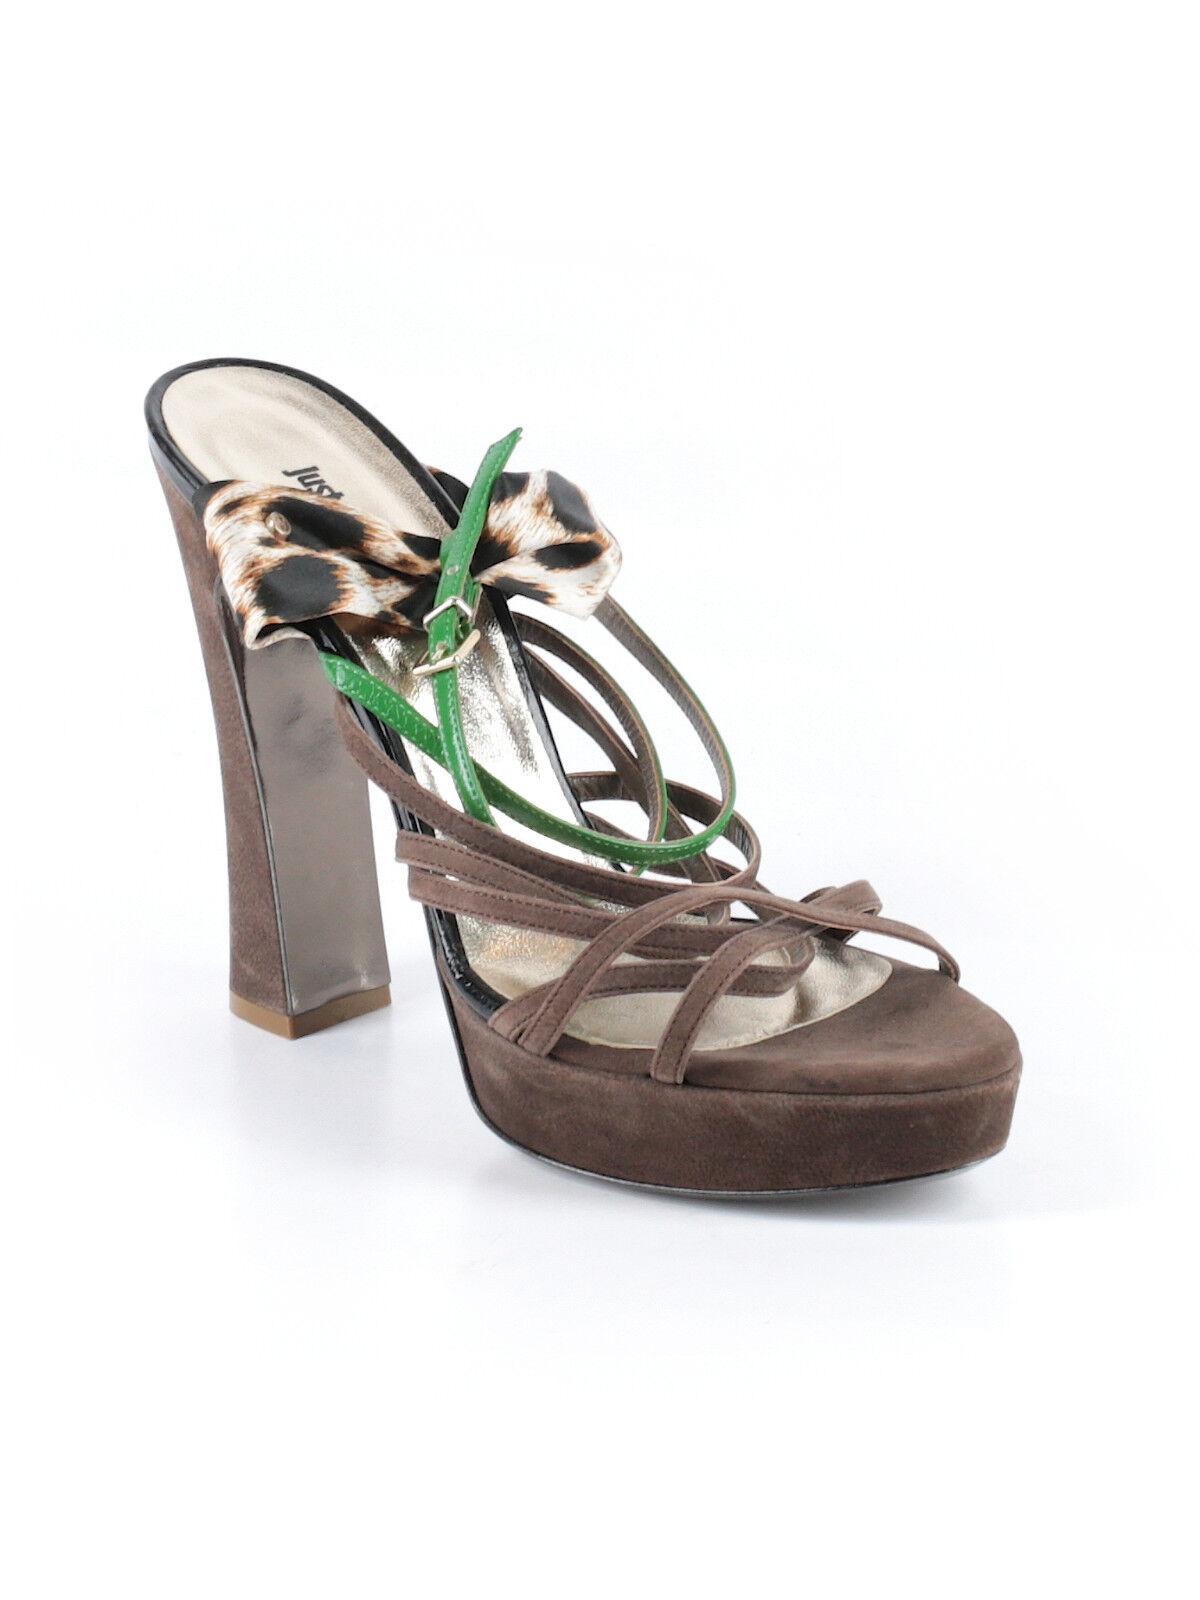 6196c90f62d Just Cavalli Brown Strappy Slingback Heels